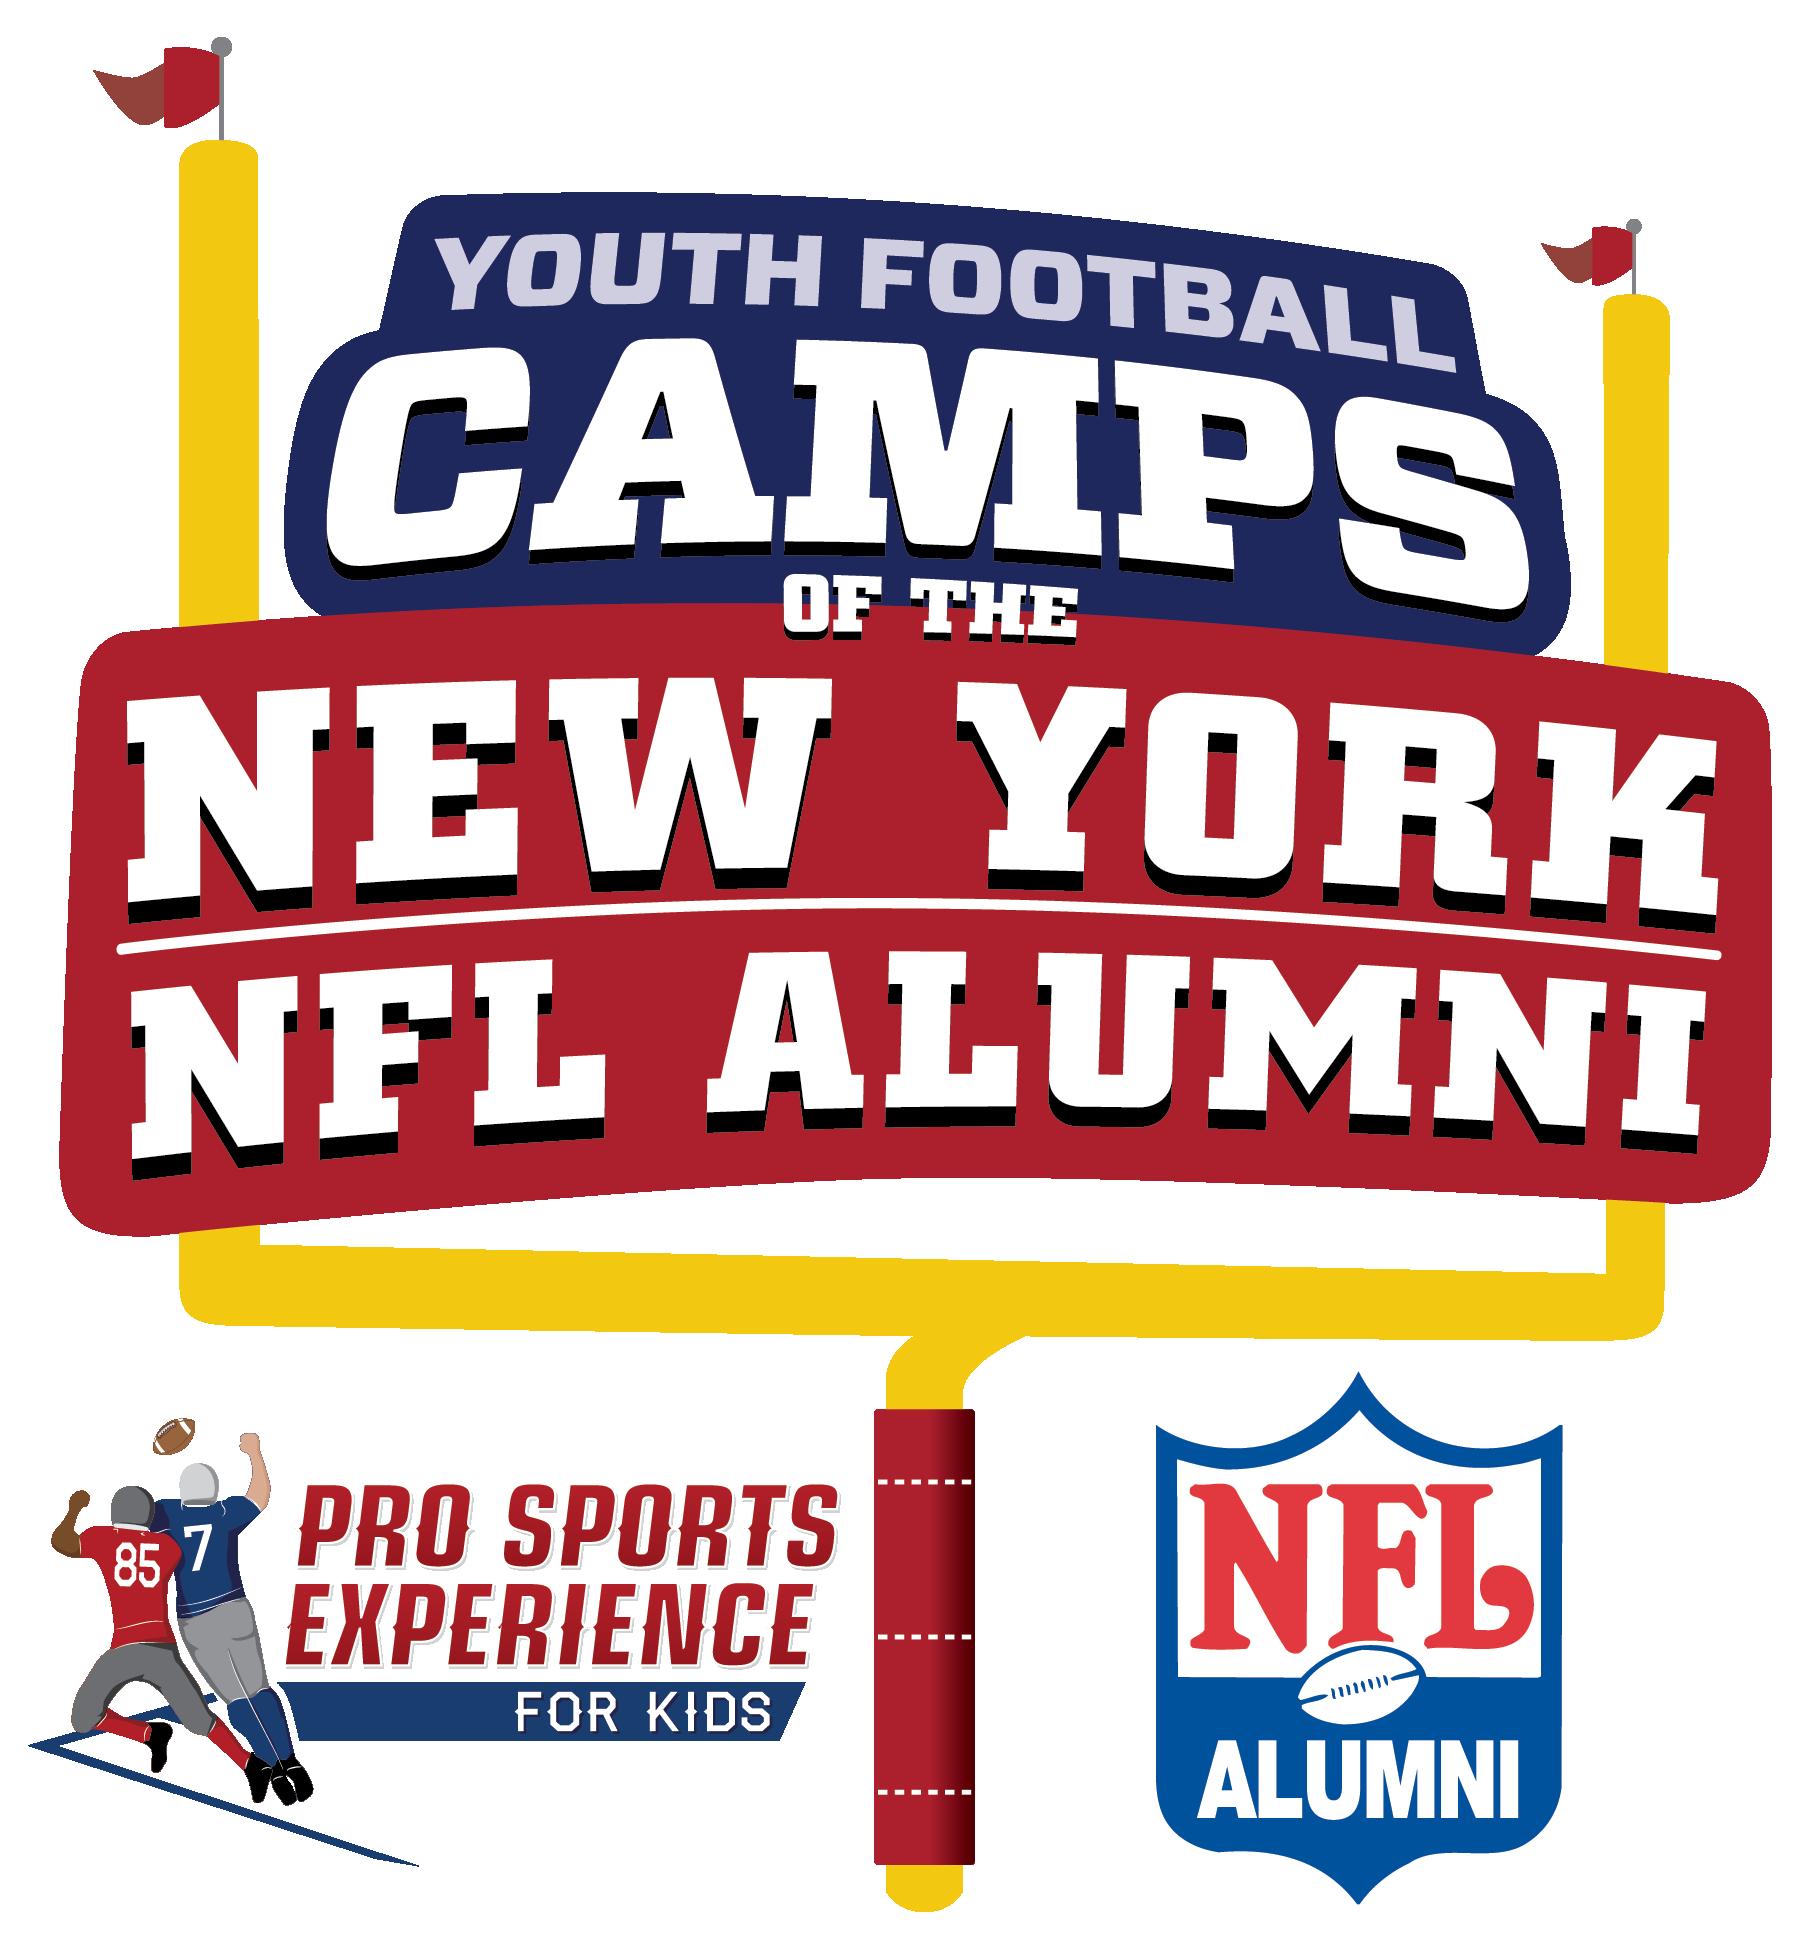 New York NFL Alumni Hero Youth Football Camps - New Rochelle